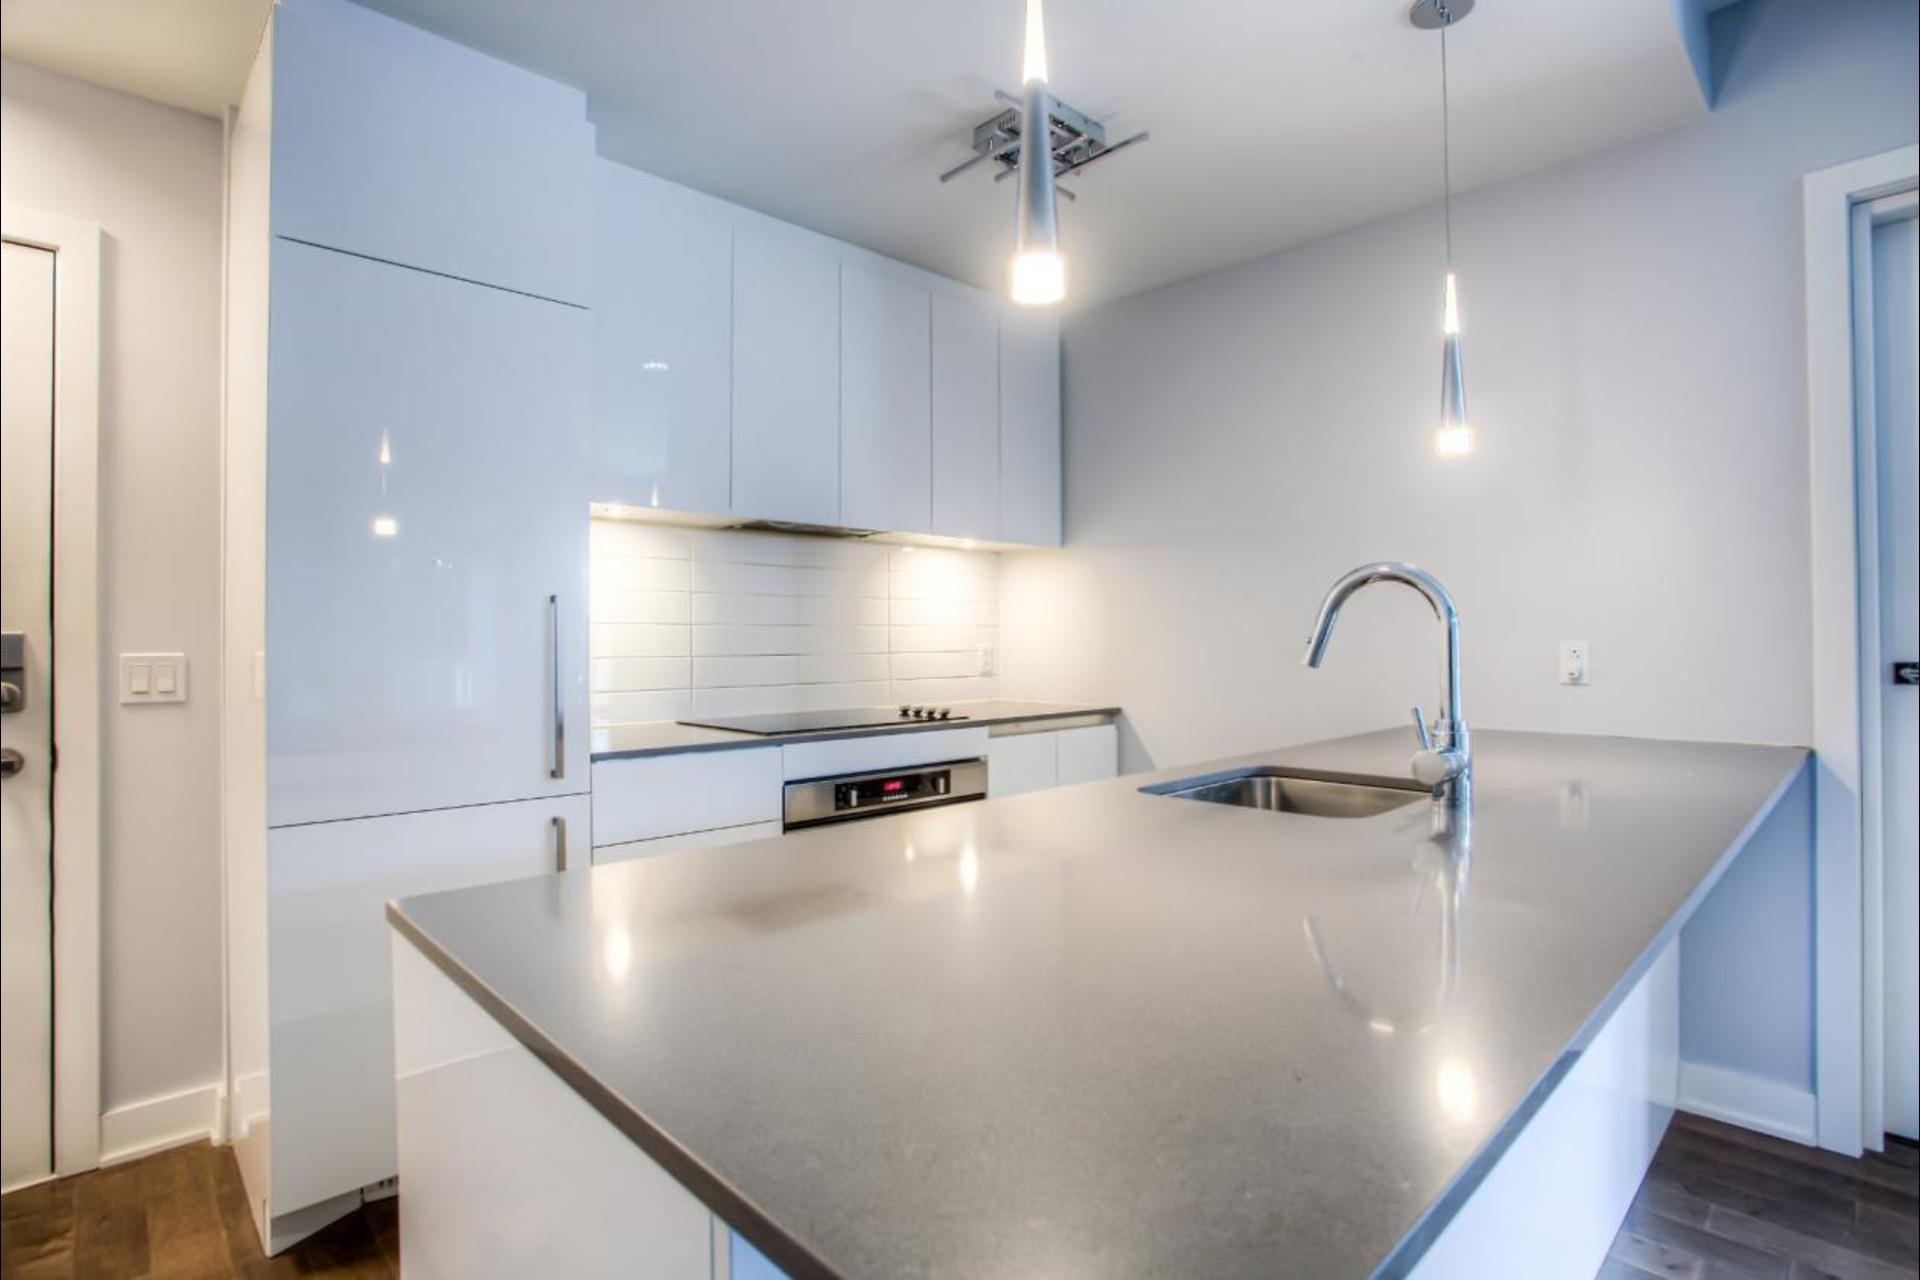 image 2 - 公寓 出租 Montréal - 6 室